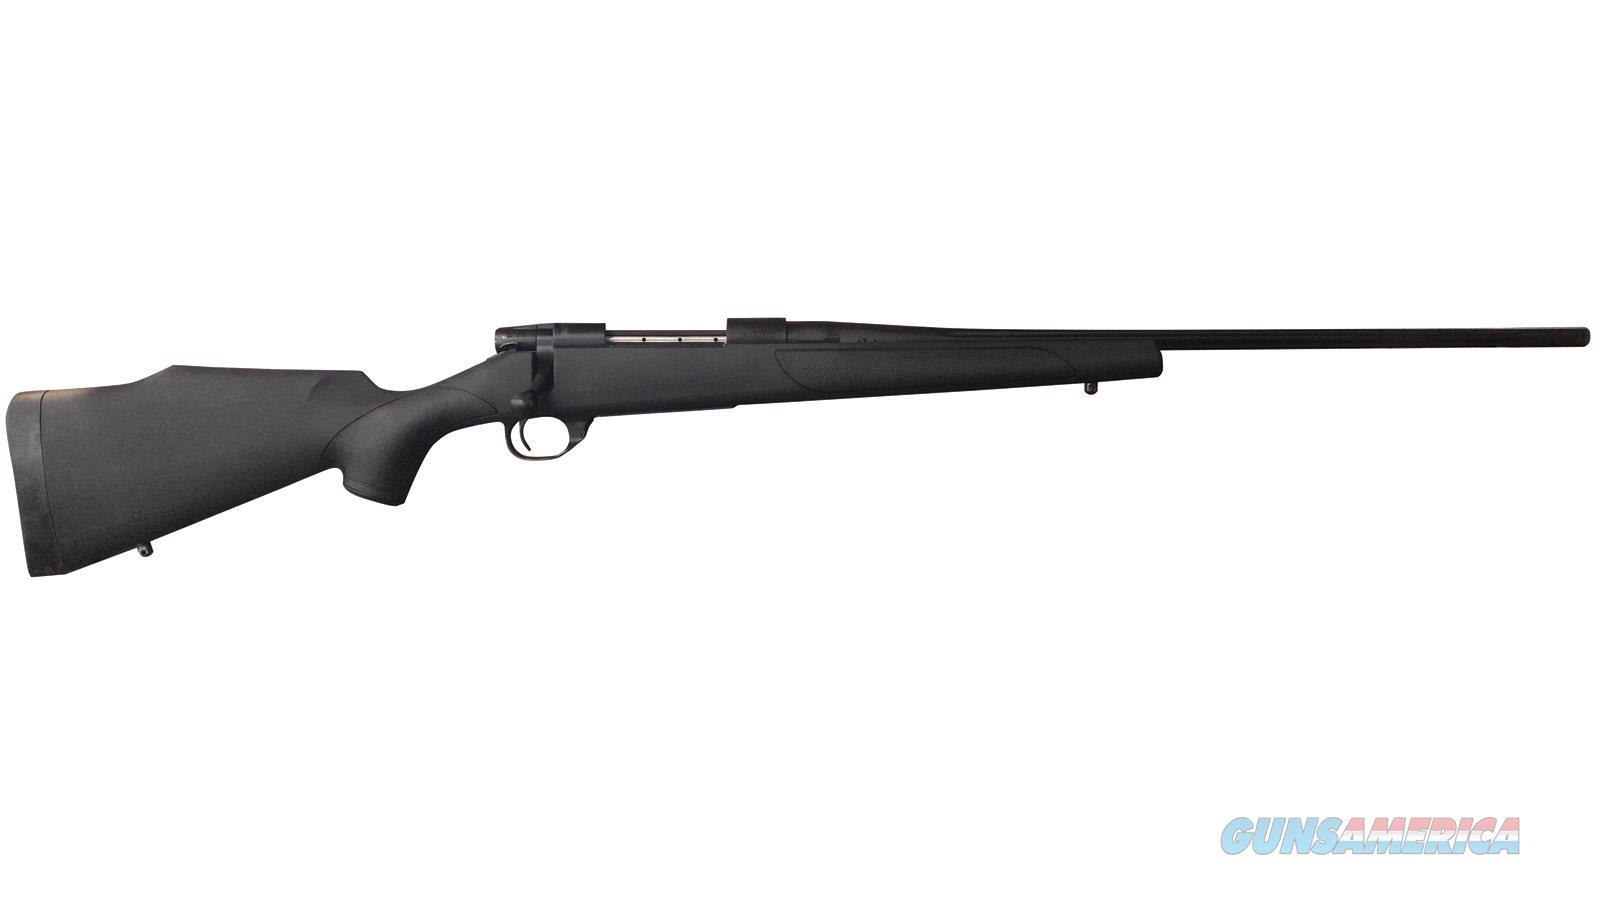 Weatherby Vanguard Vfa 257Wby Mag VFA257WR4O  Guns > Rifles > W Misc Rifles